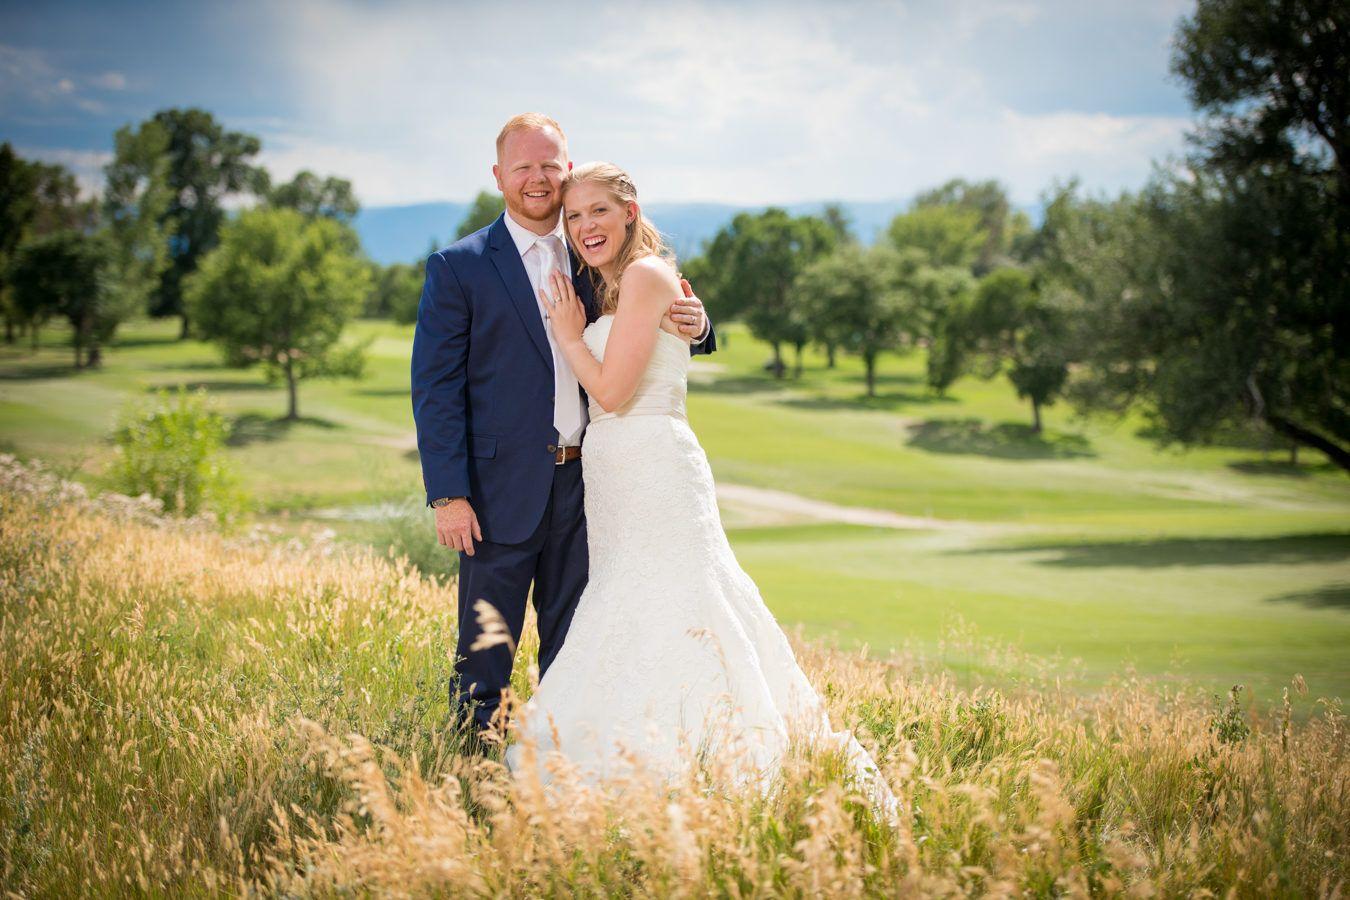 Wellshire Event Center Wedding Golf Course Photos